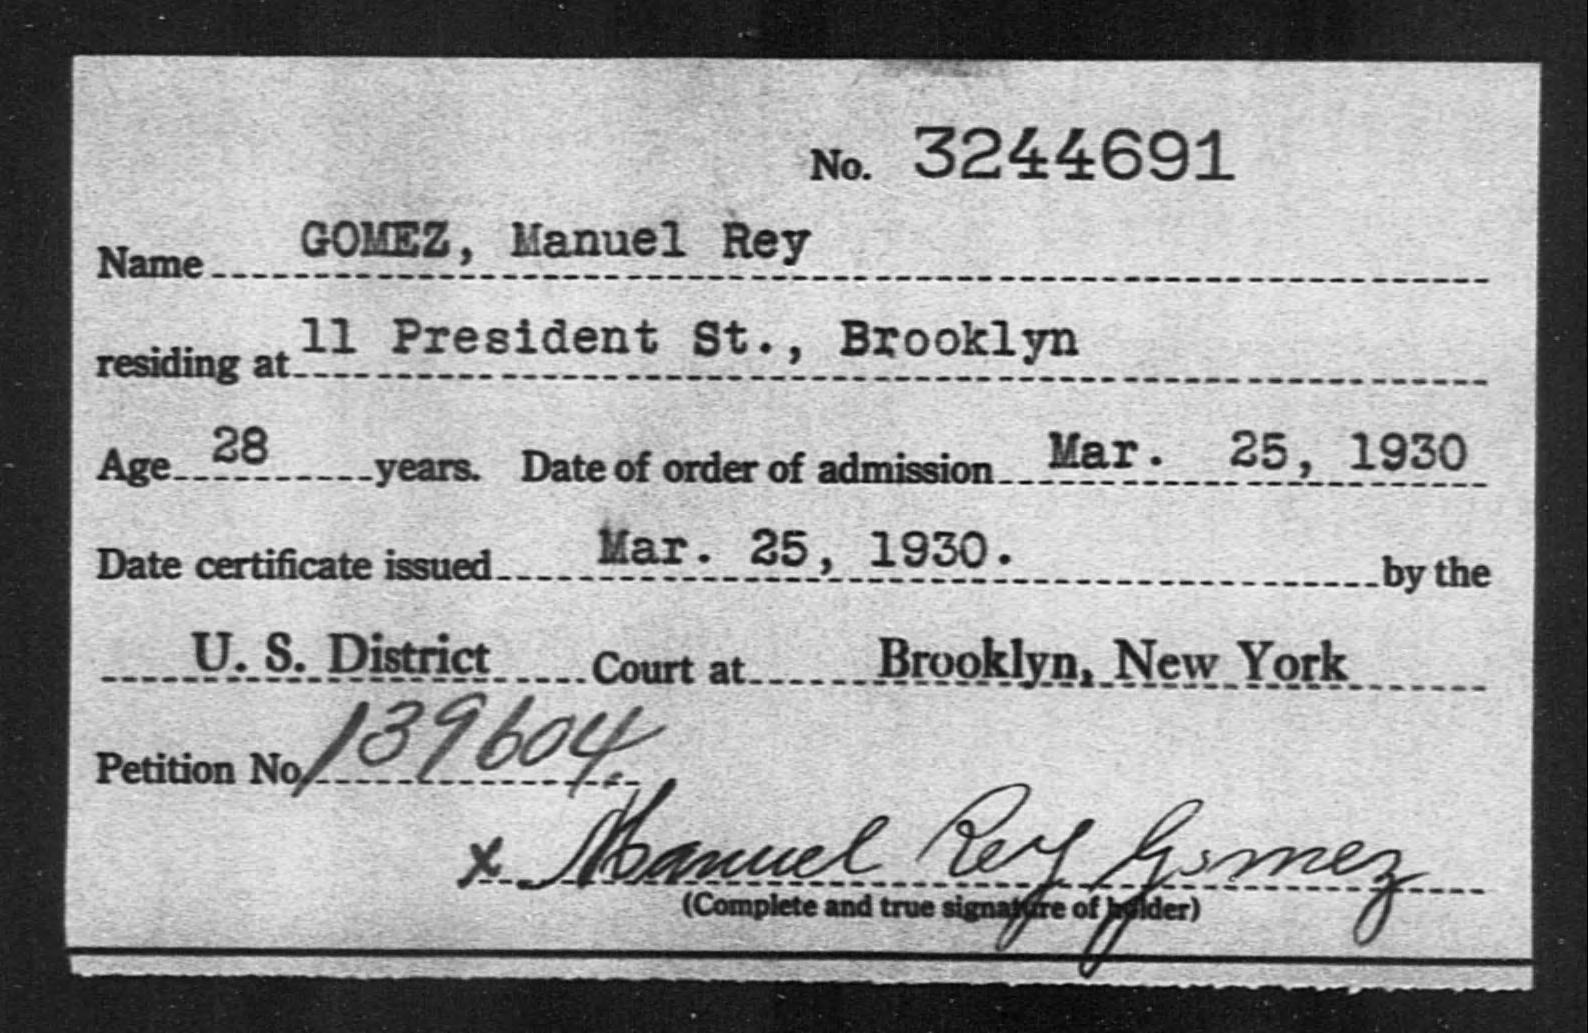 GOMEZ, Manuel Rey - Born: [BLANK], Naturalized: 1930